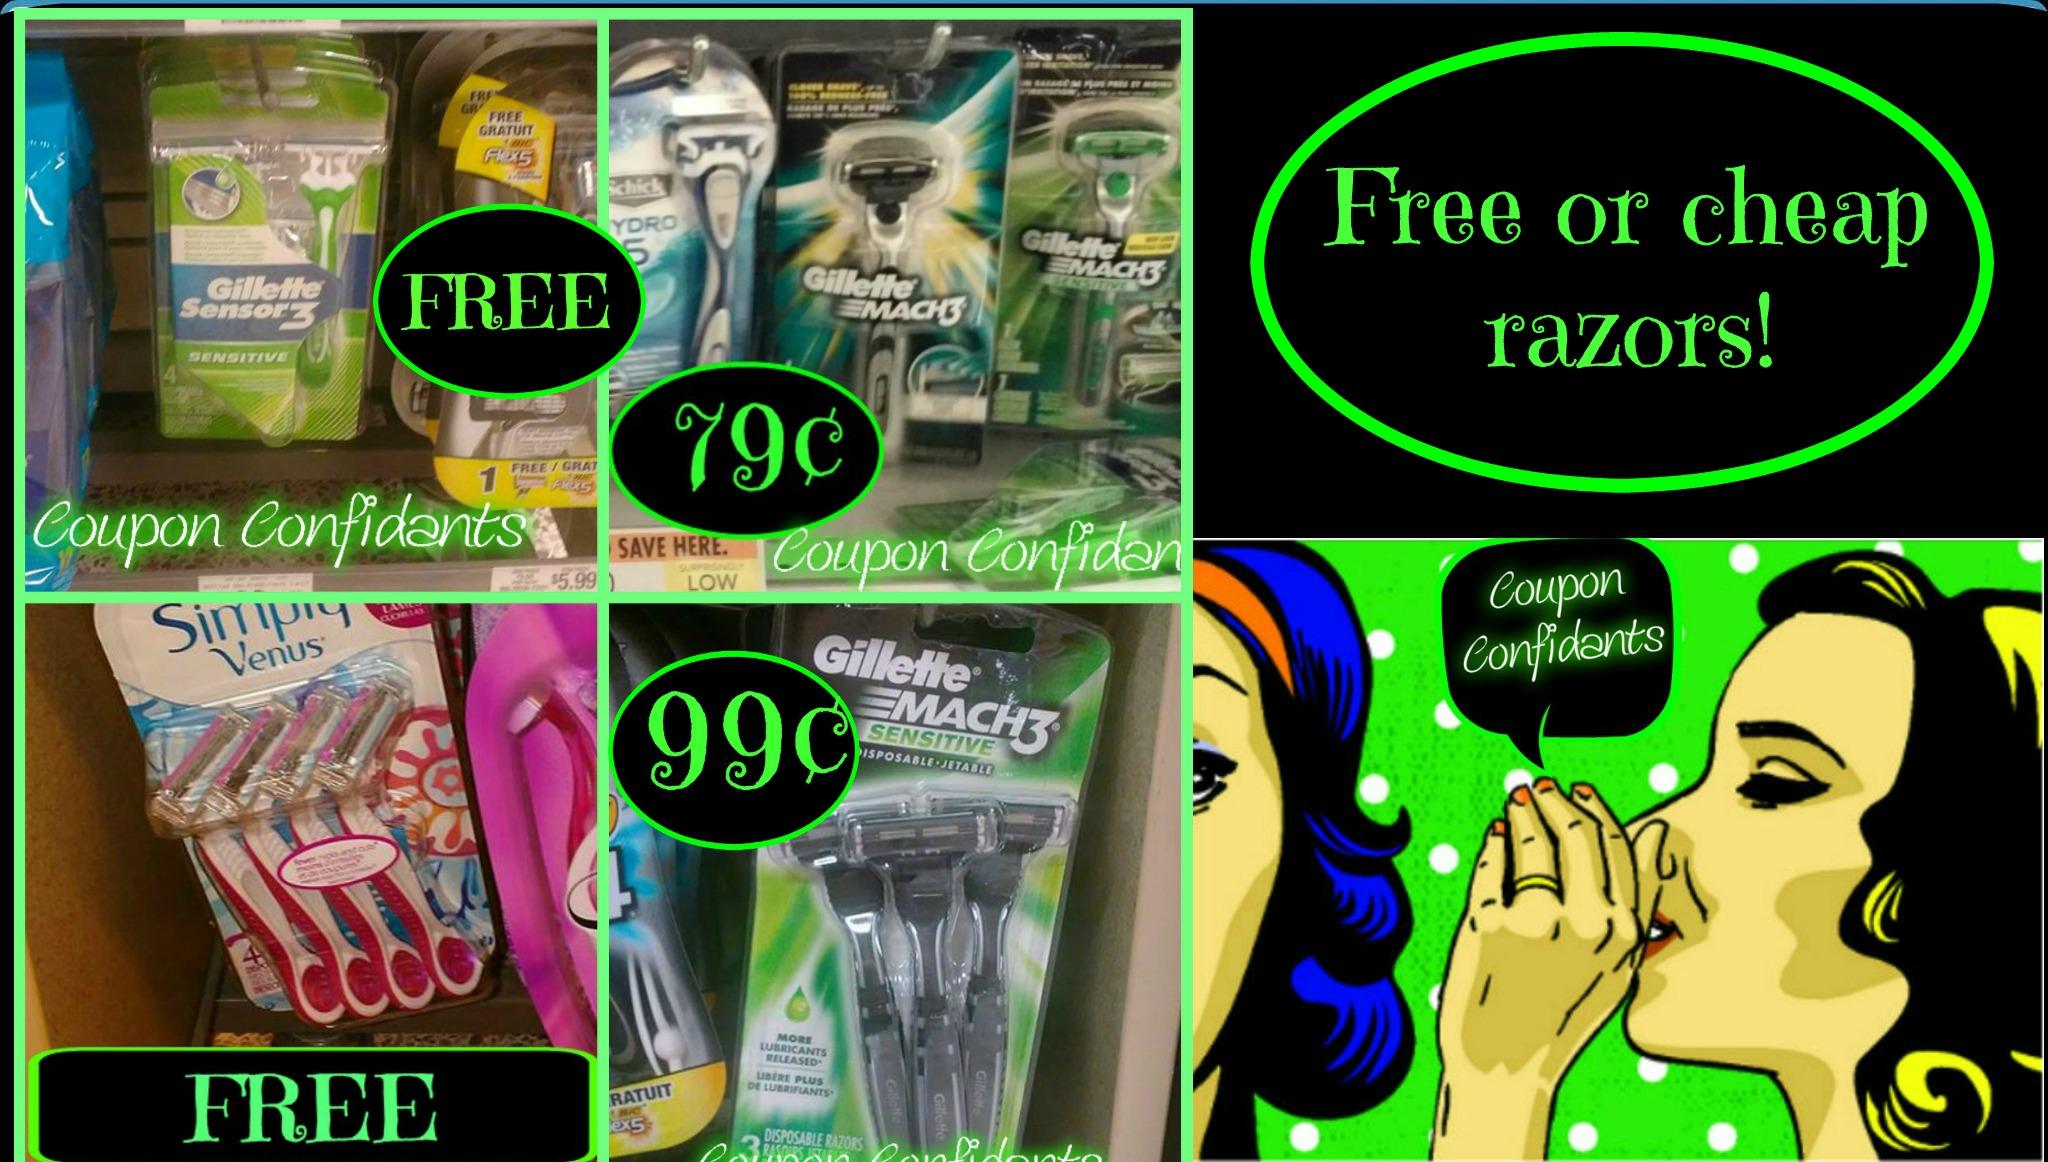 Free gillette razor coupons